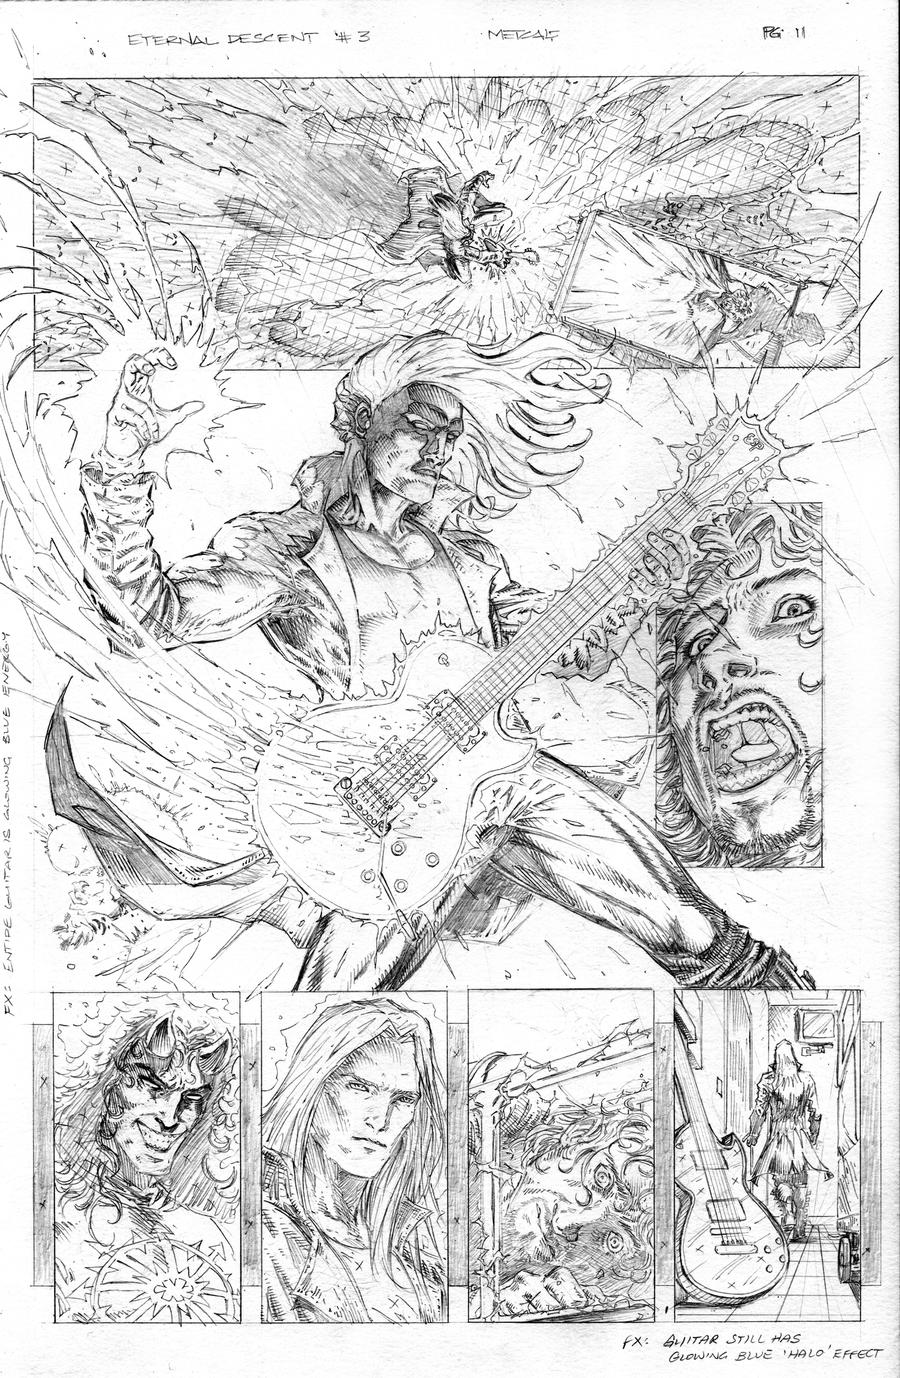 Eternal Descent 3 pg 11 by JMan-3H